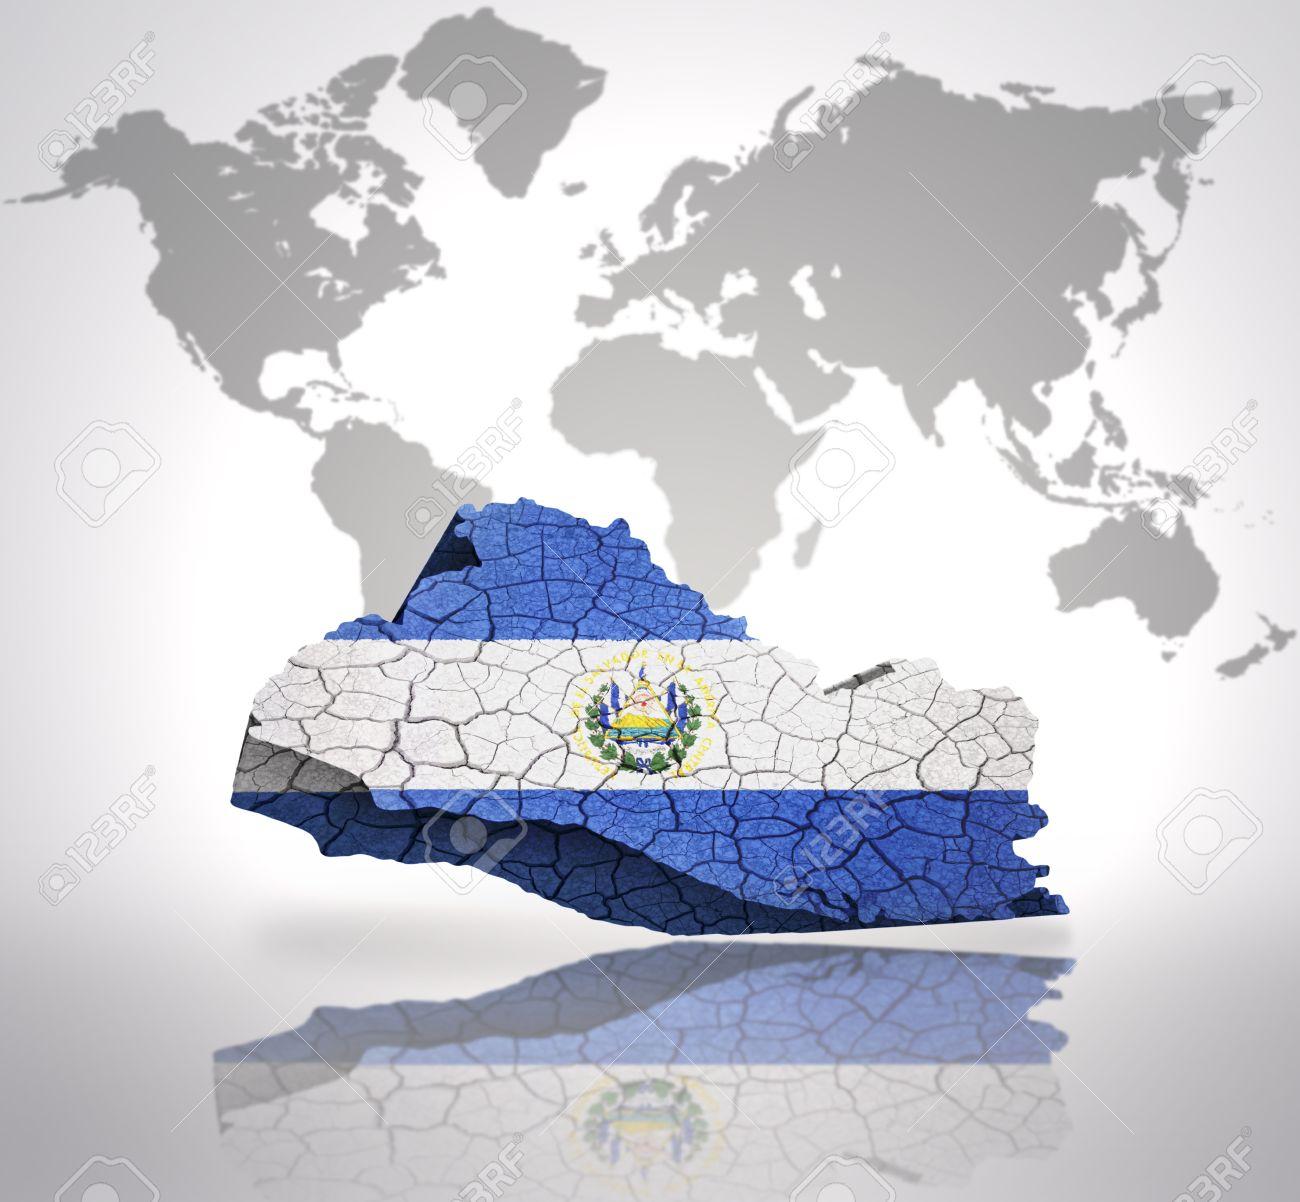 Map Of El Salvador With El Salvador Flag On A World Map Background